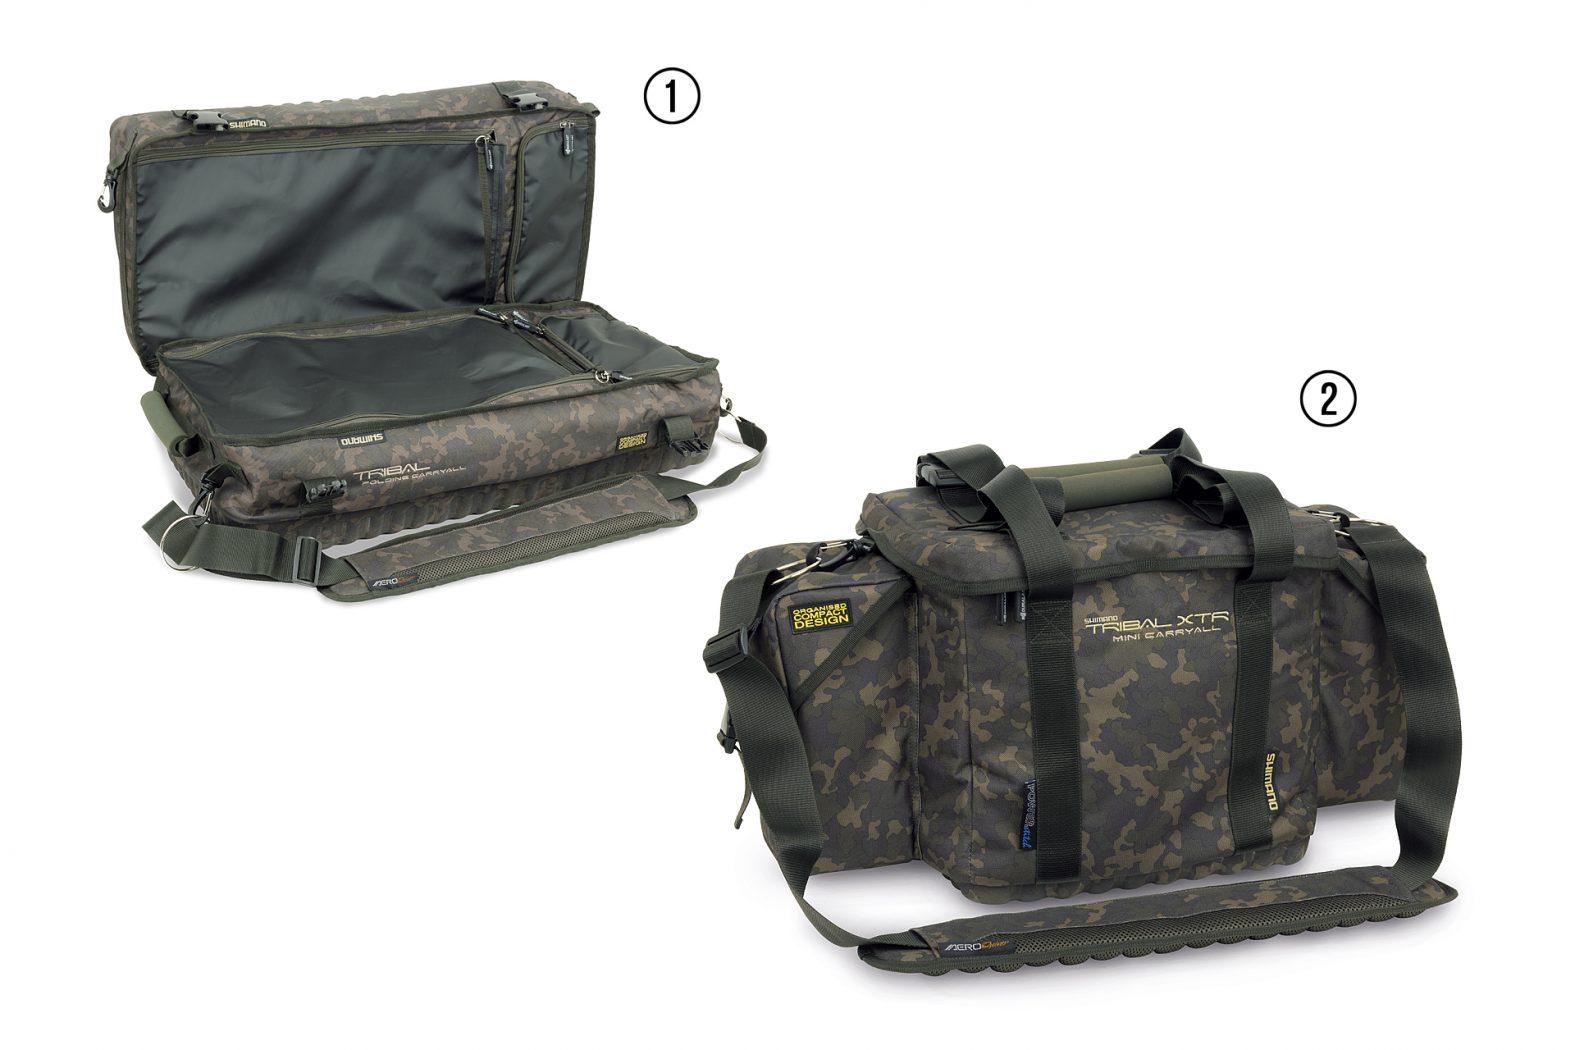 Tribal XTR Mini Carryall und Folding Carryall